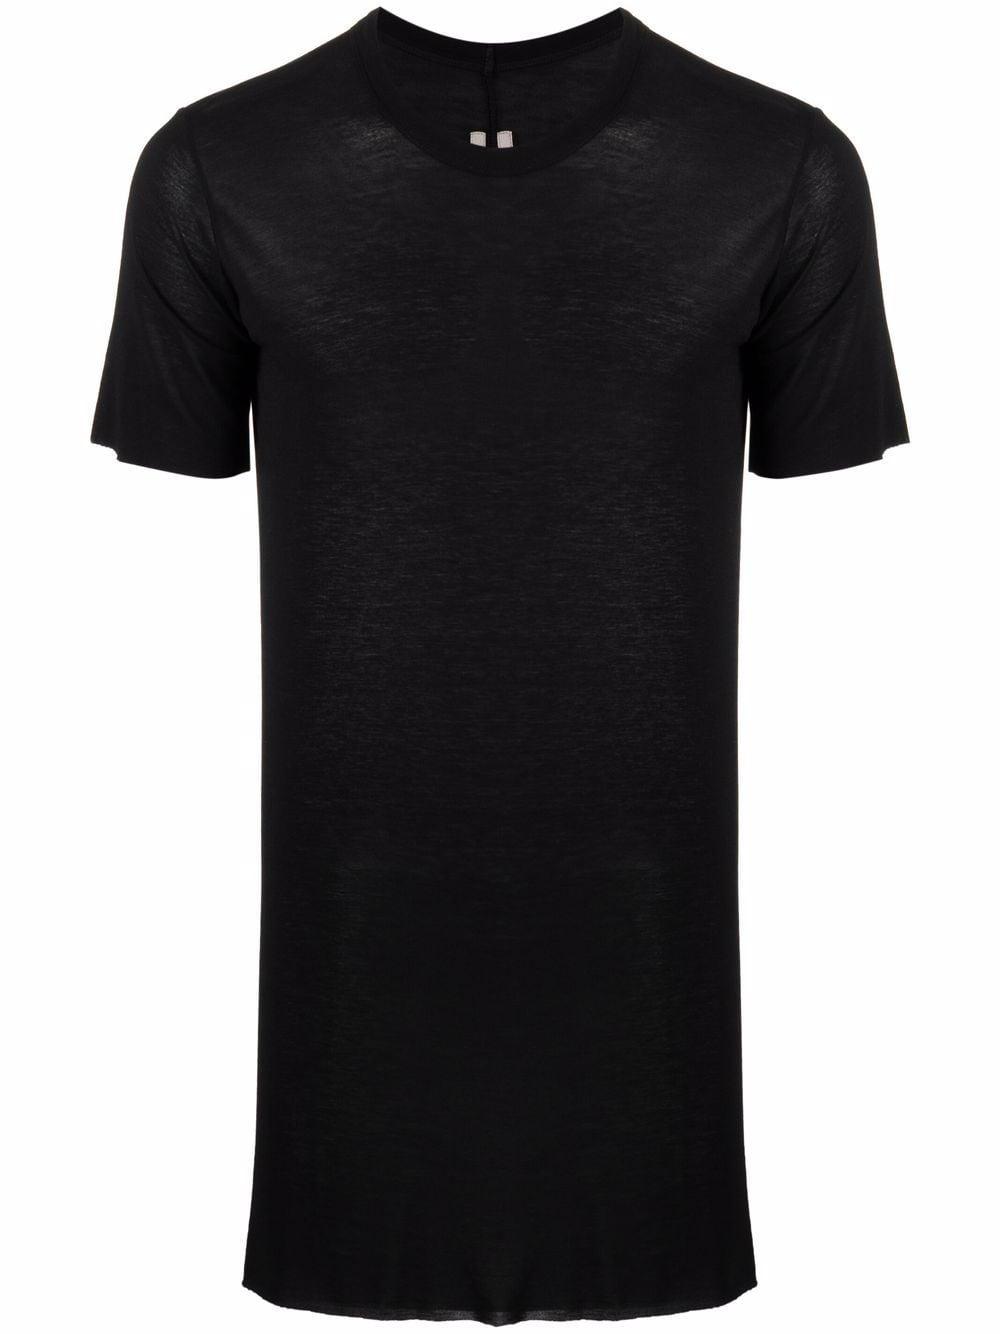 silk blend t-shirt man black RICK OWENS | T-shirts | RU02A5251 JS09